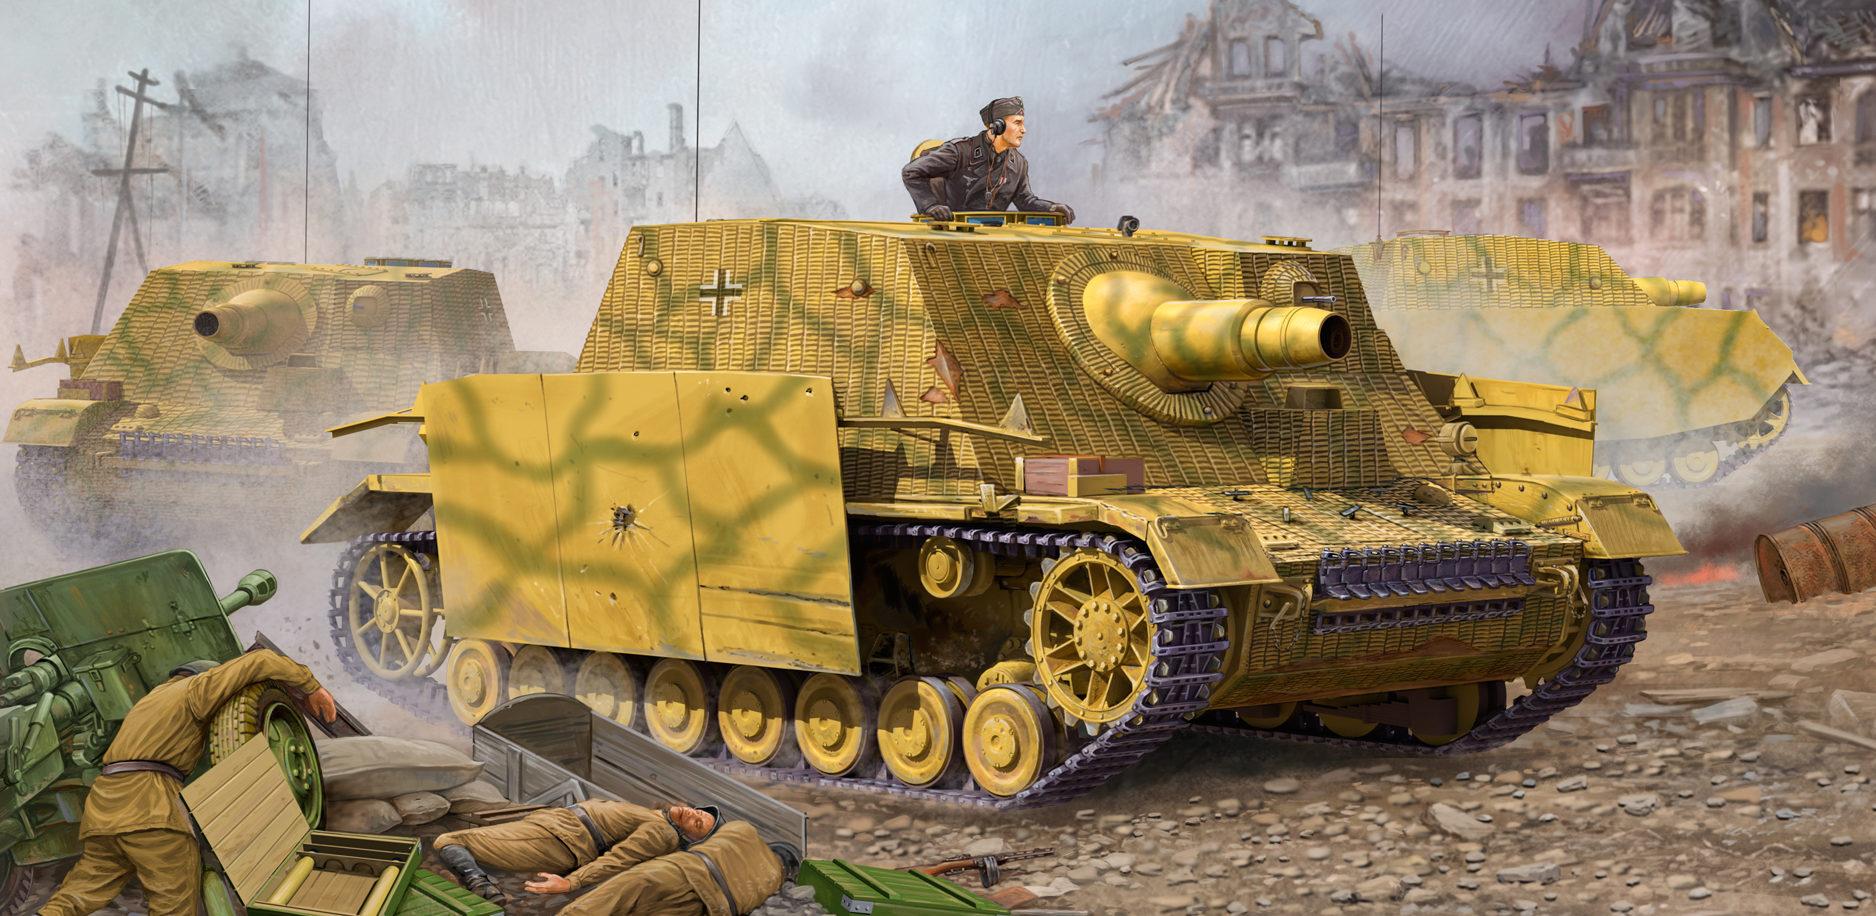 Wai Vincent. САУ Sturmpanzer IV.